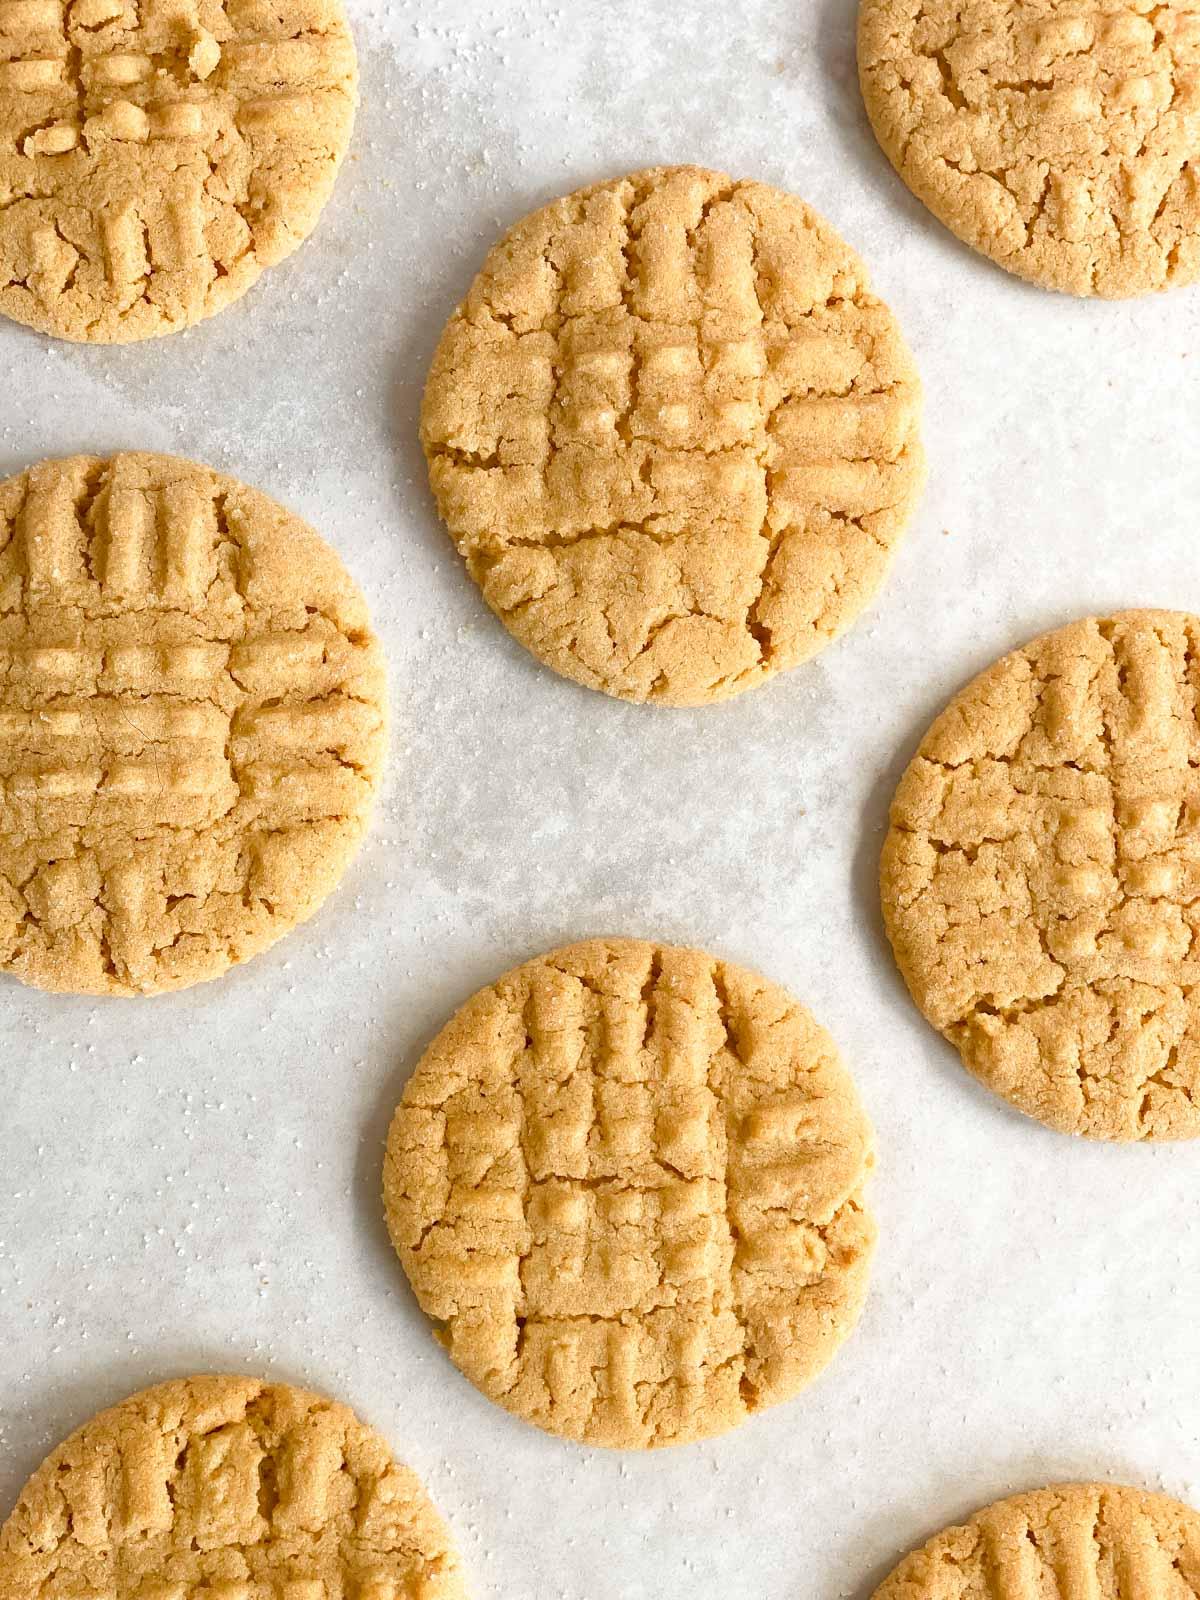 peanut butter cookies on parchment paper